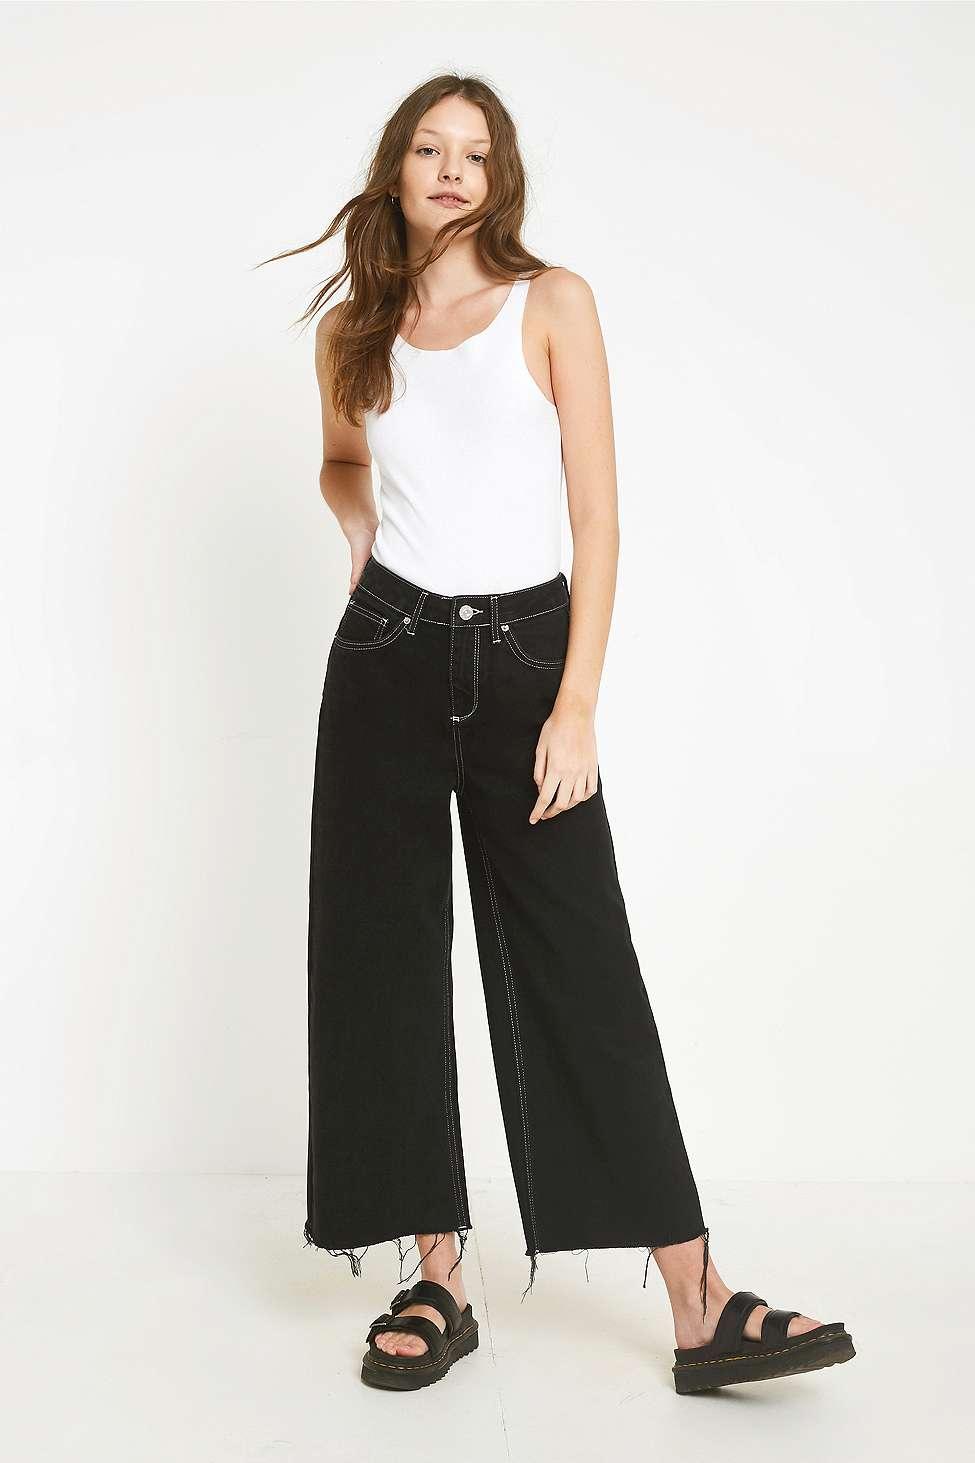 BDG Flood Black Contrast Stitch Jeans, Black  &  White